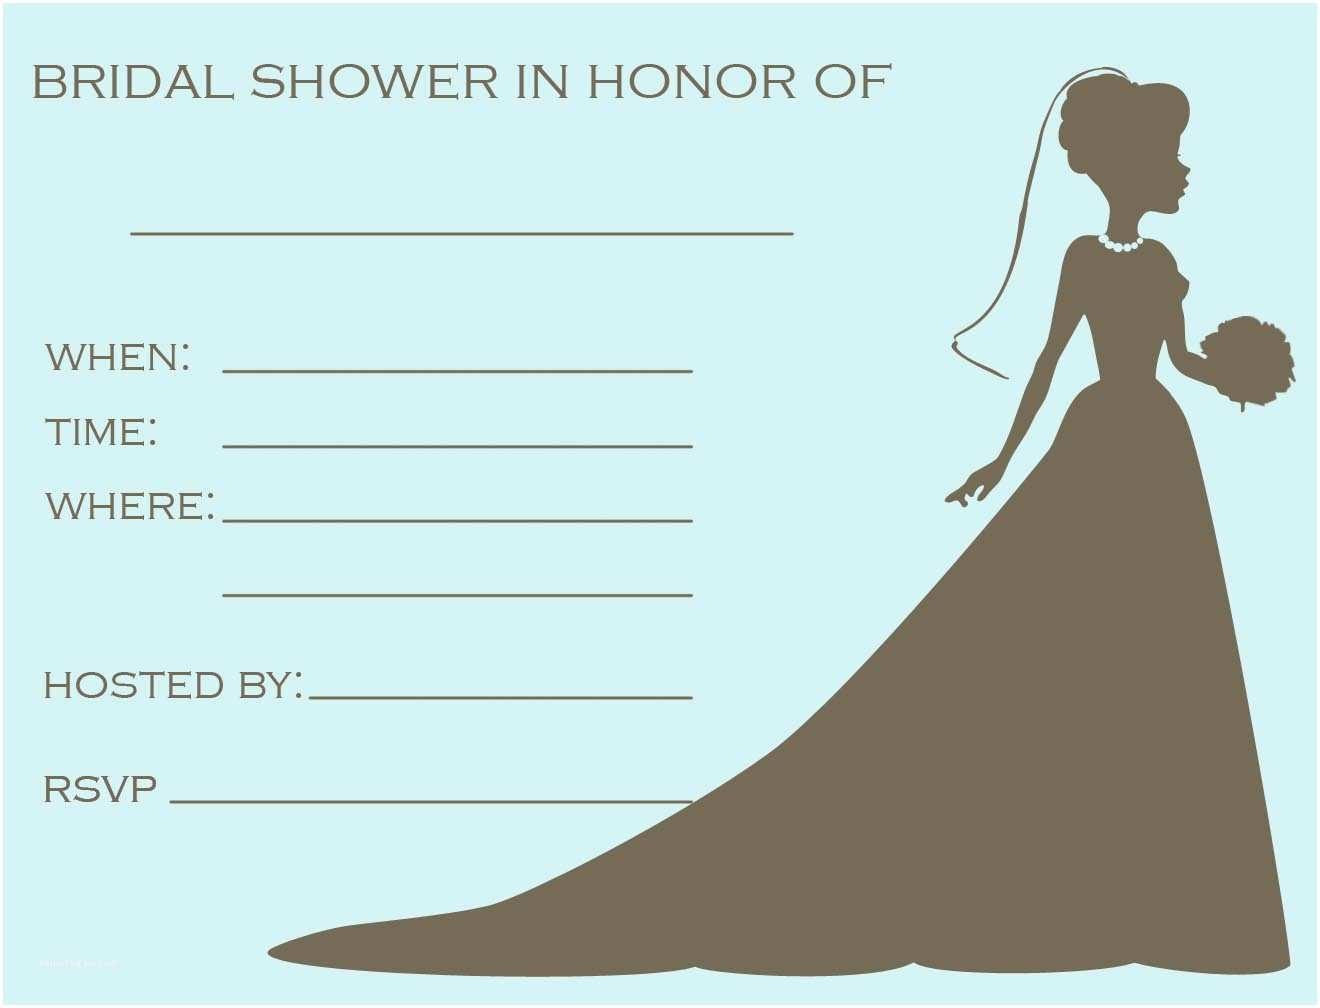 Bridal Shower Invitation Templates 12 Mesmerizing Free Bridal Shower Flyer Templates Demplates